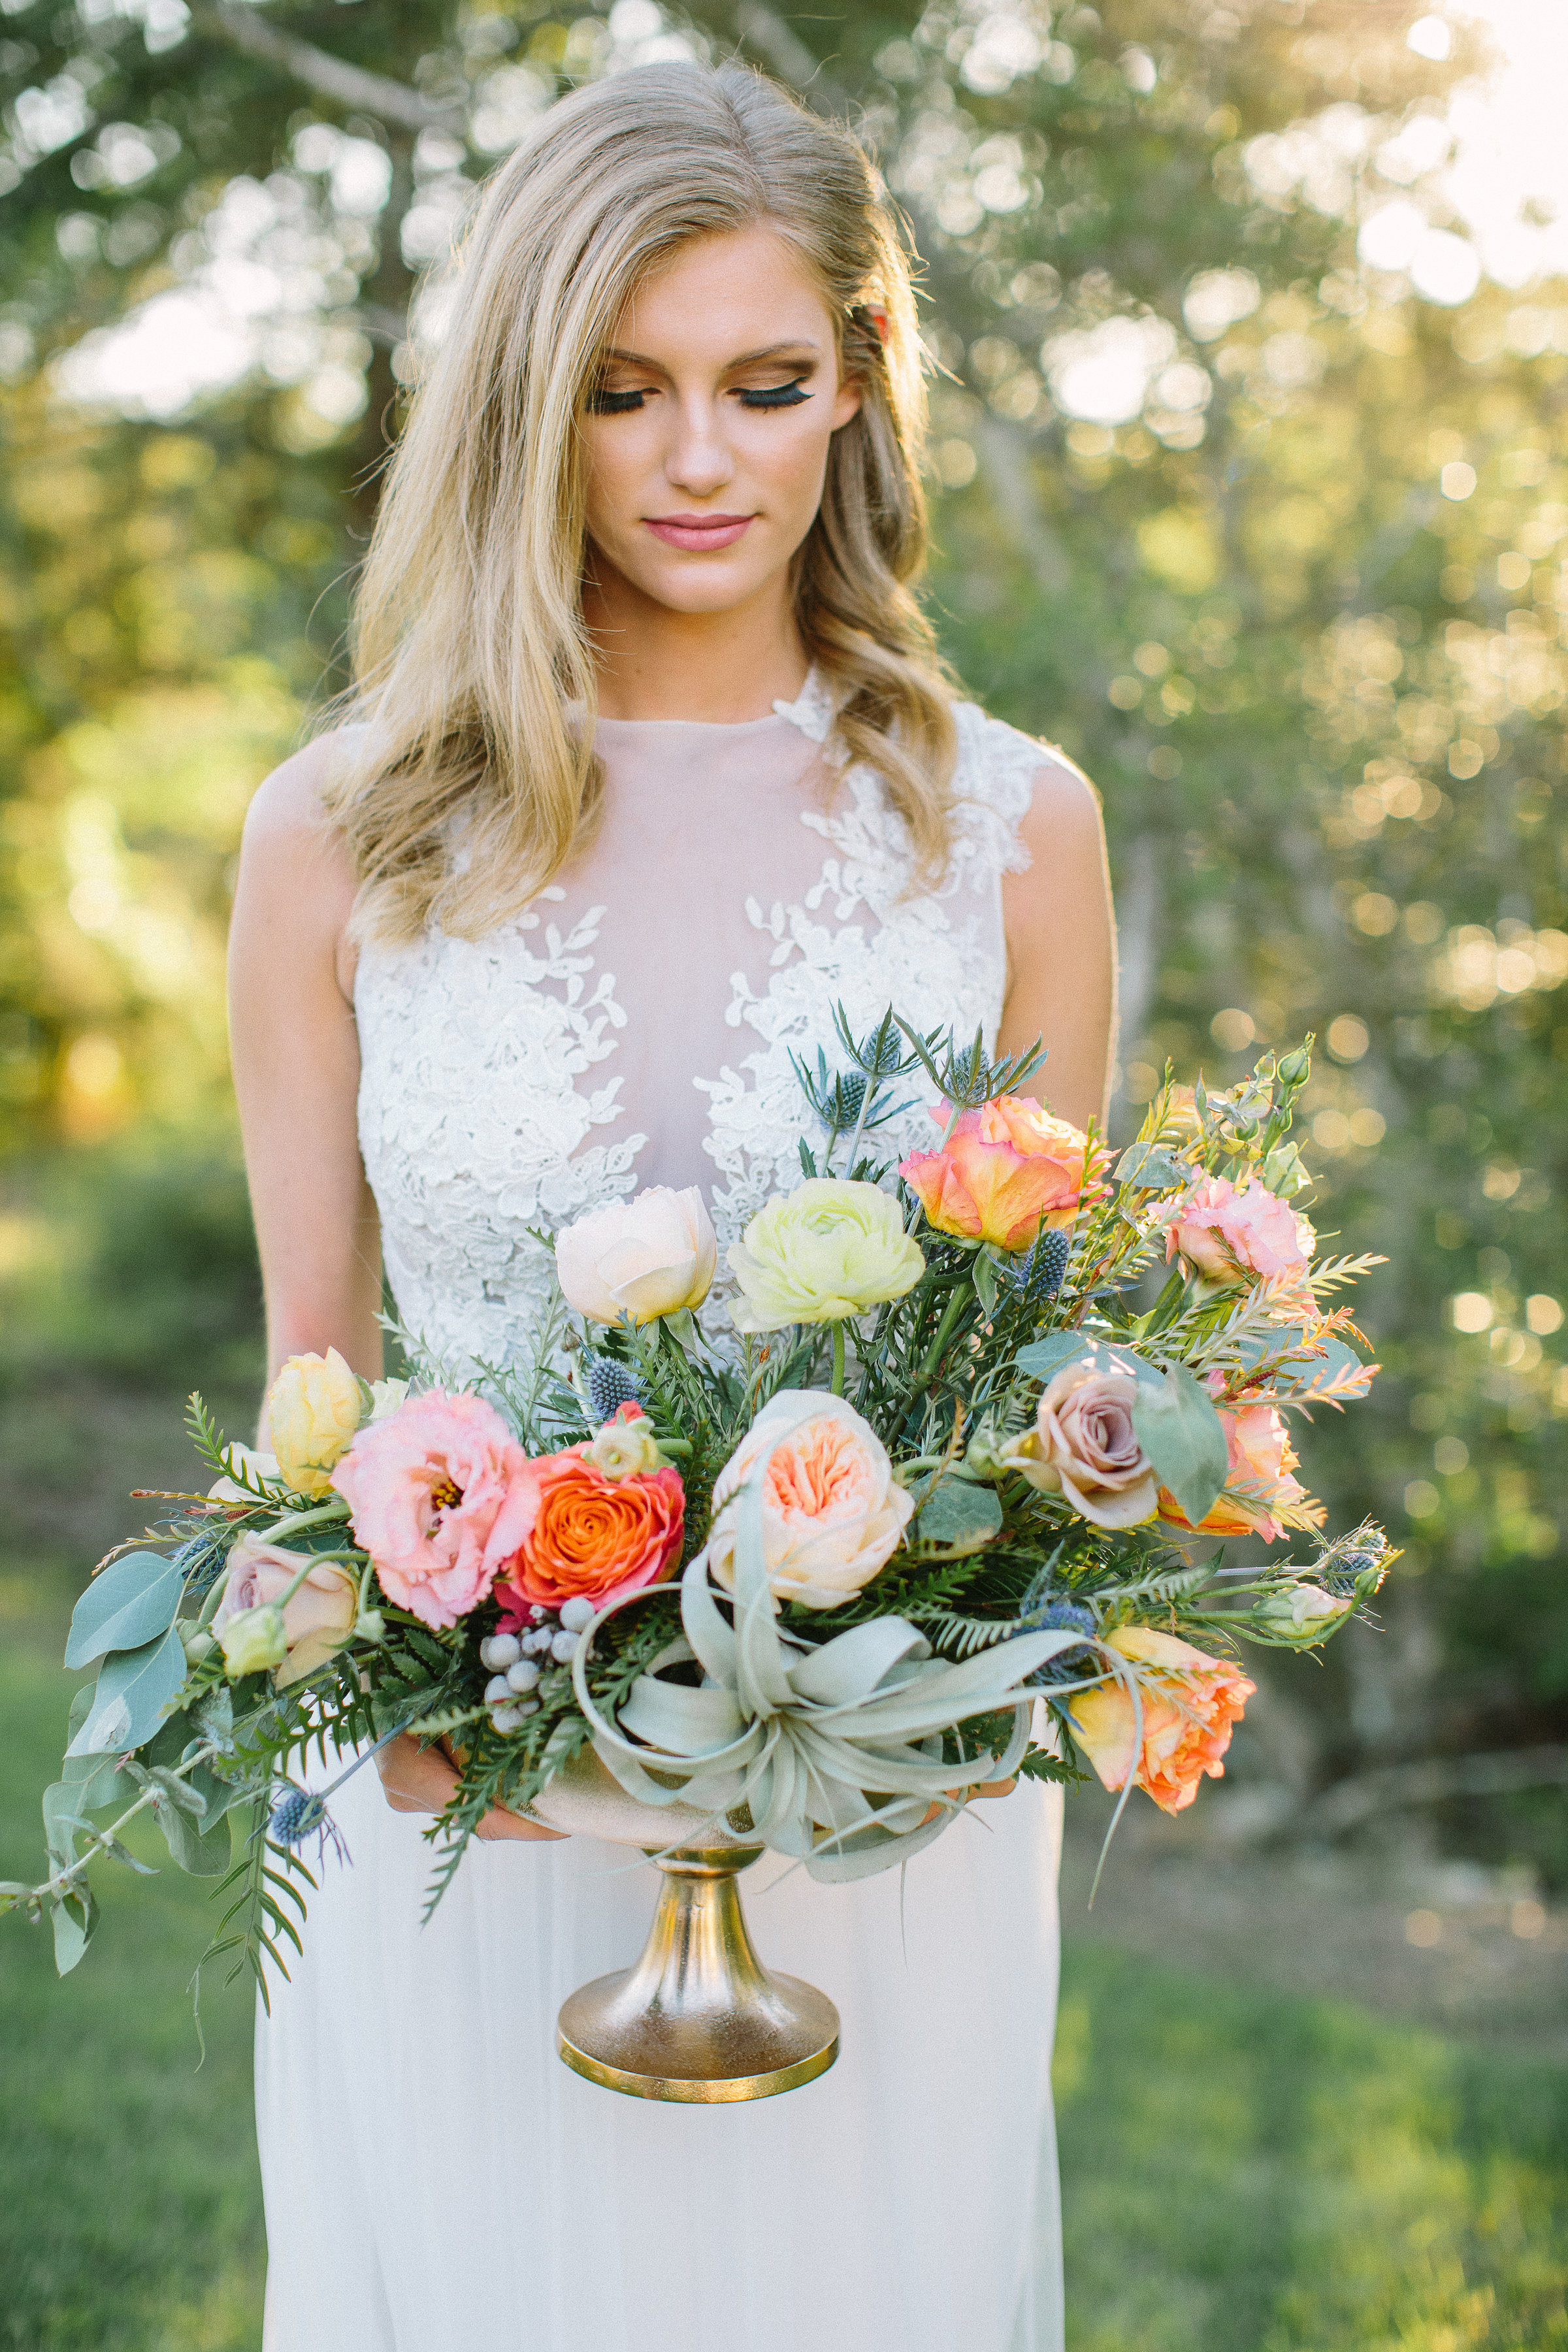 Ellen-Ashton-Photography-Peach-Creek-Ranch-Weddings-Wed-and-Prosper261